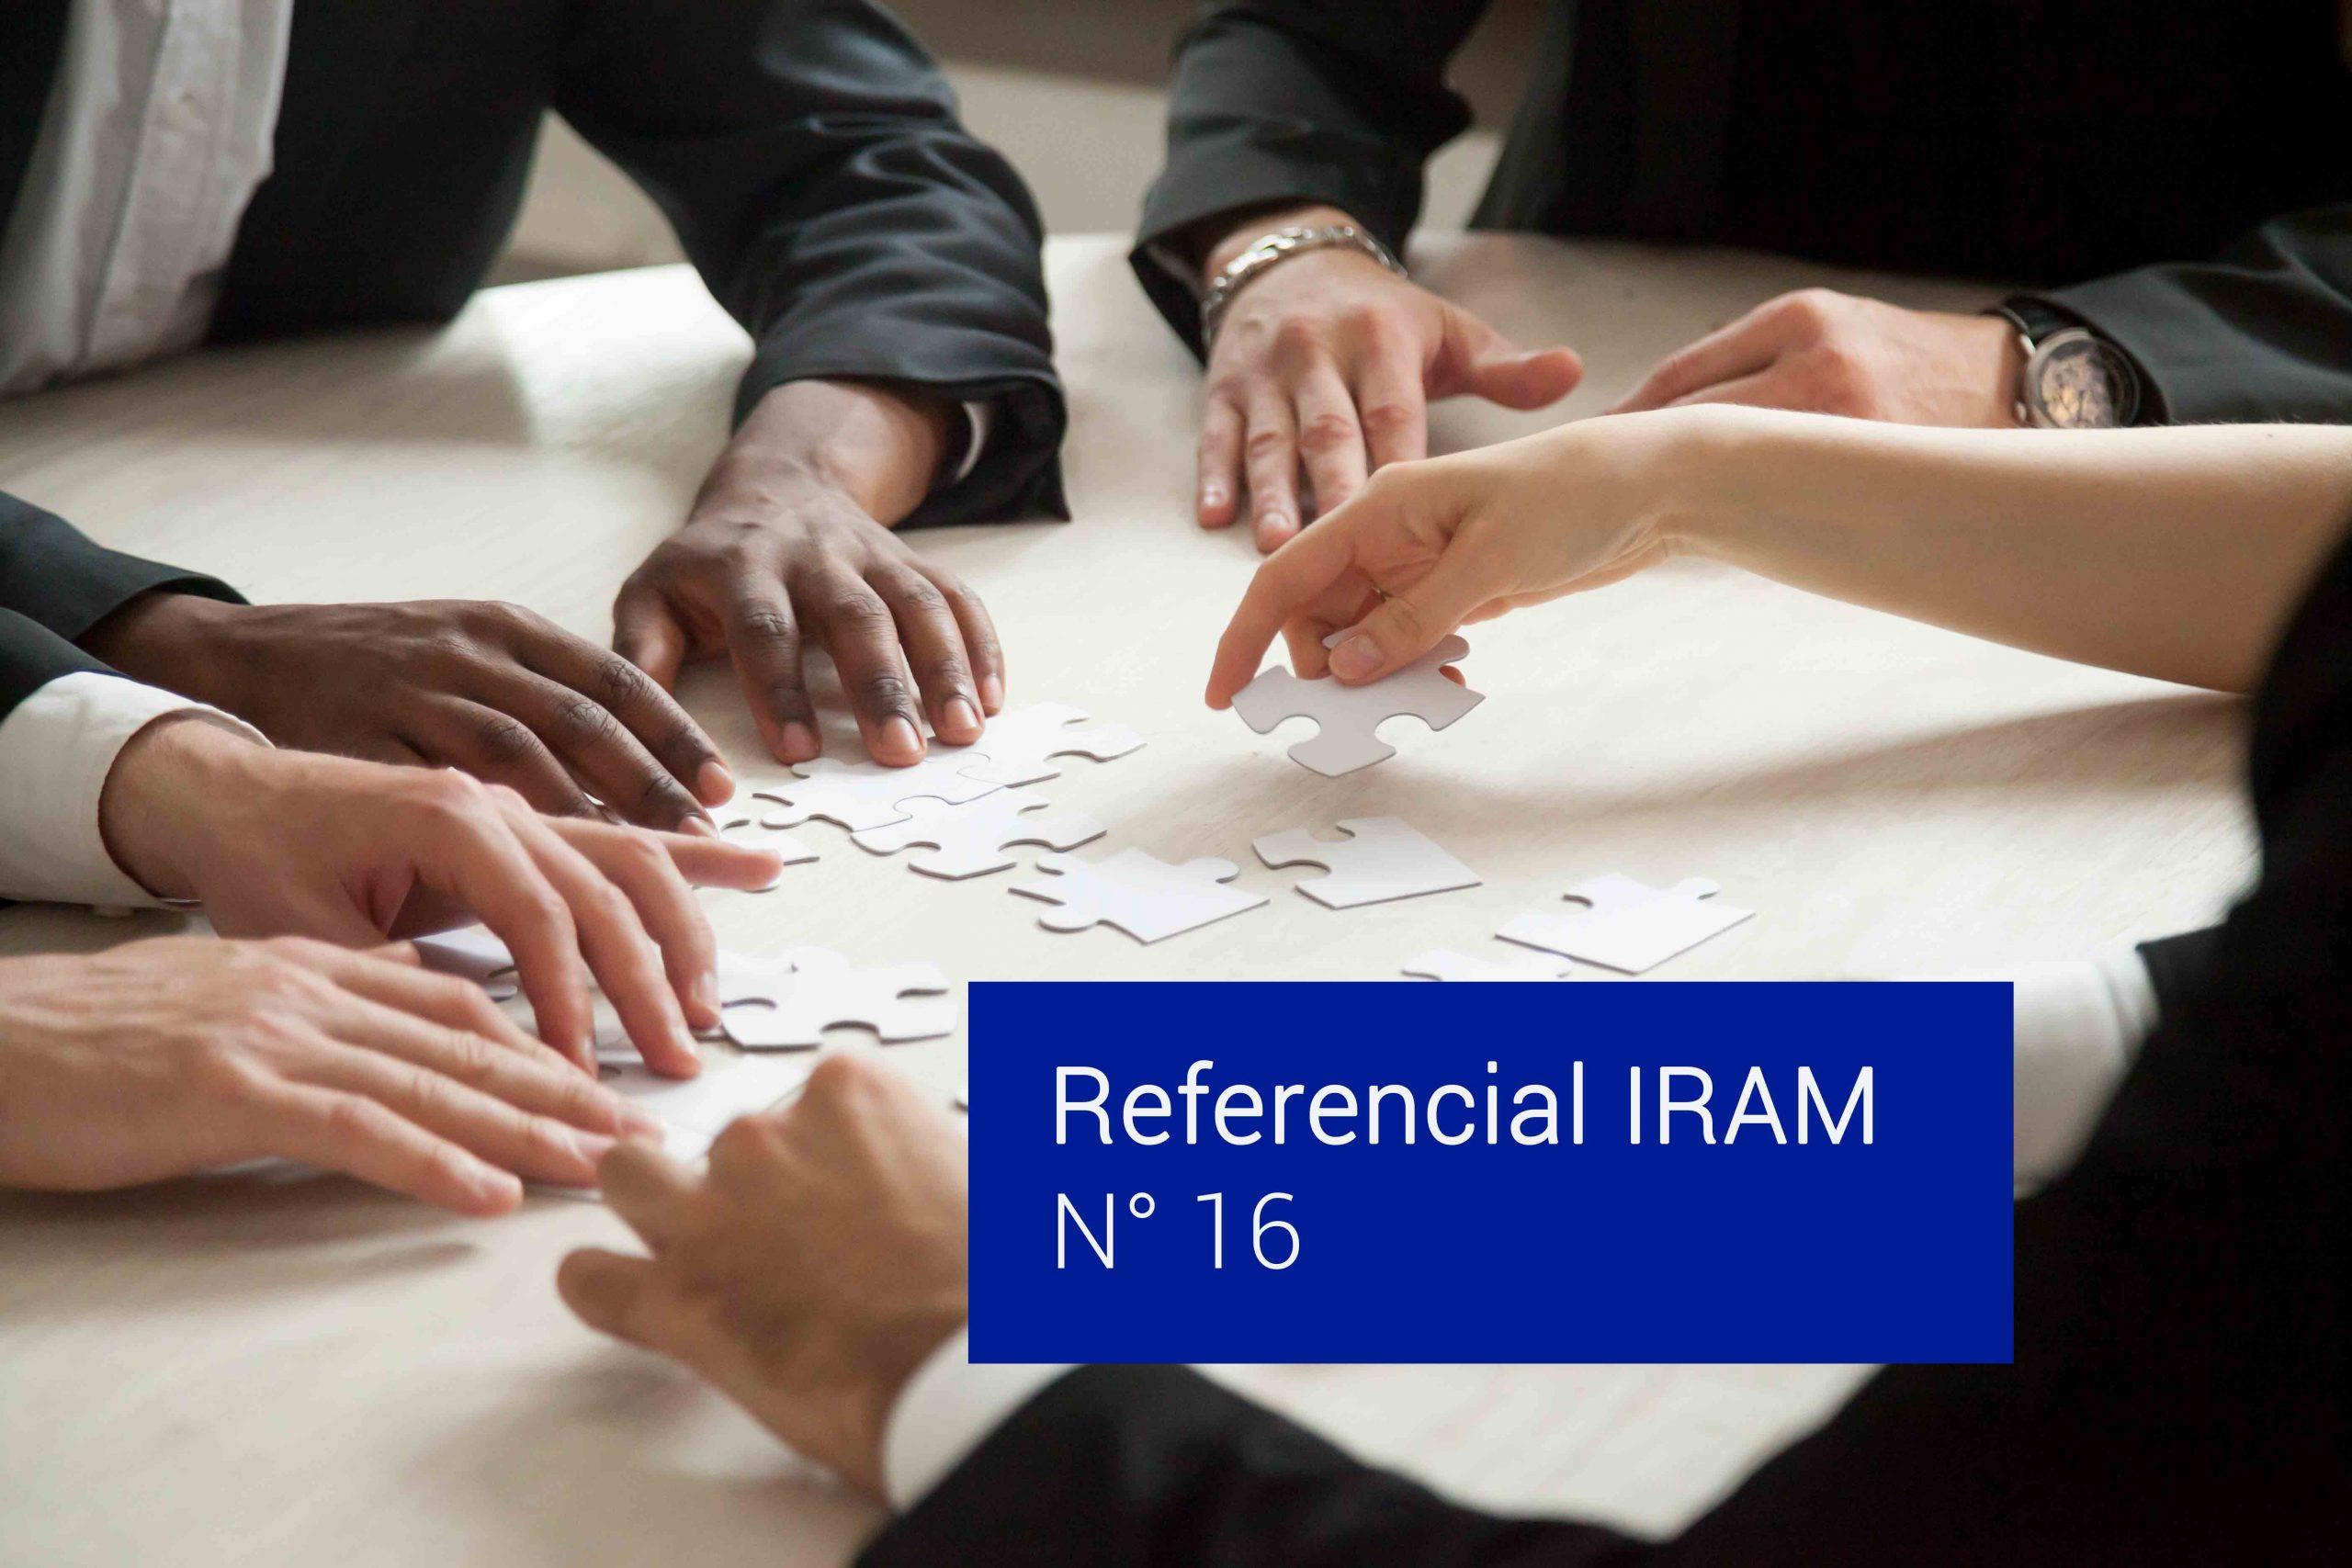 IRAM Referencial 16